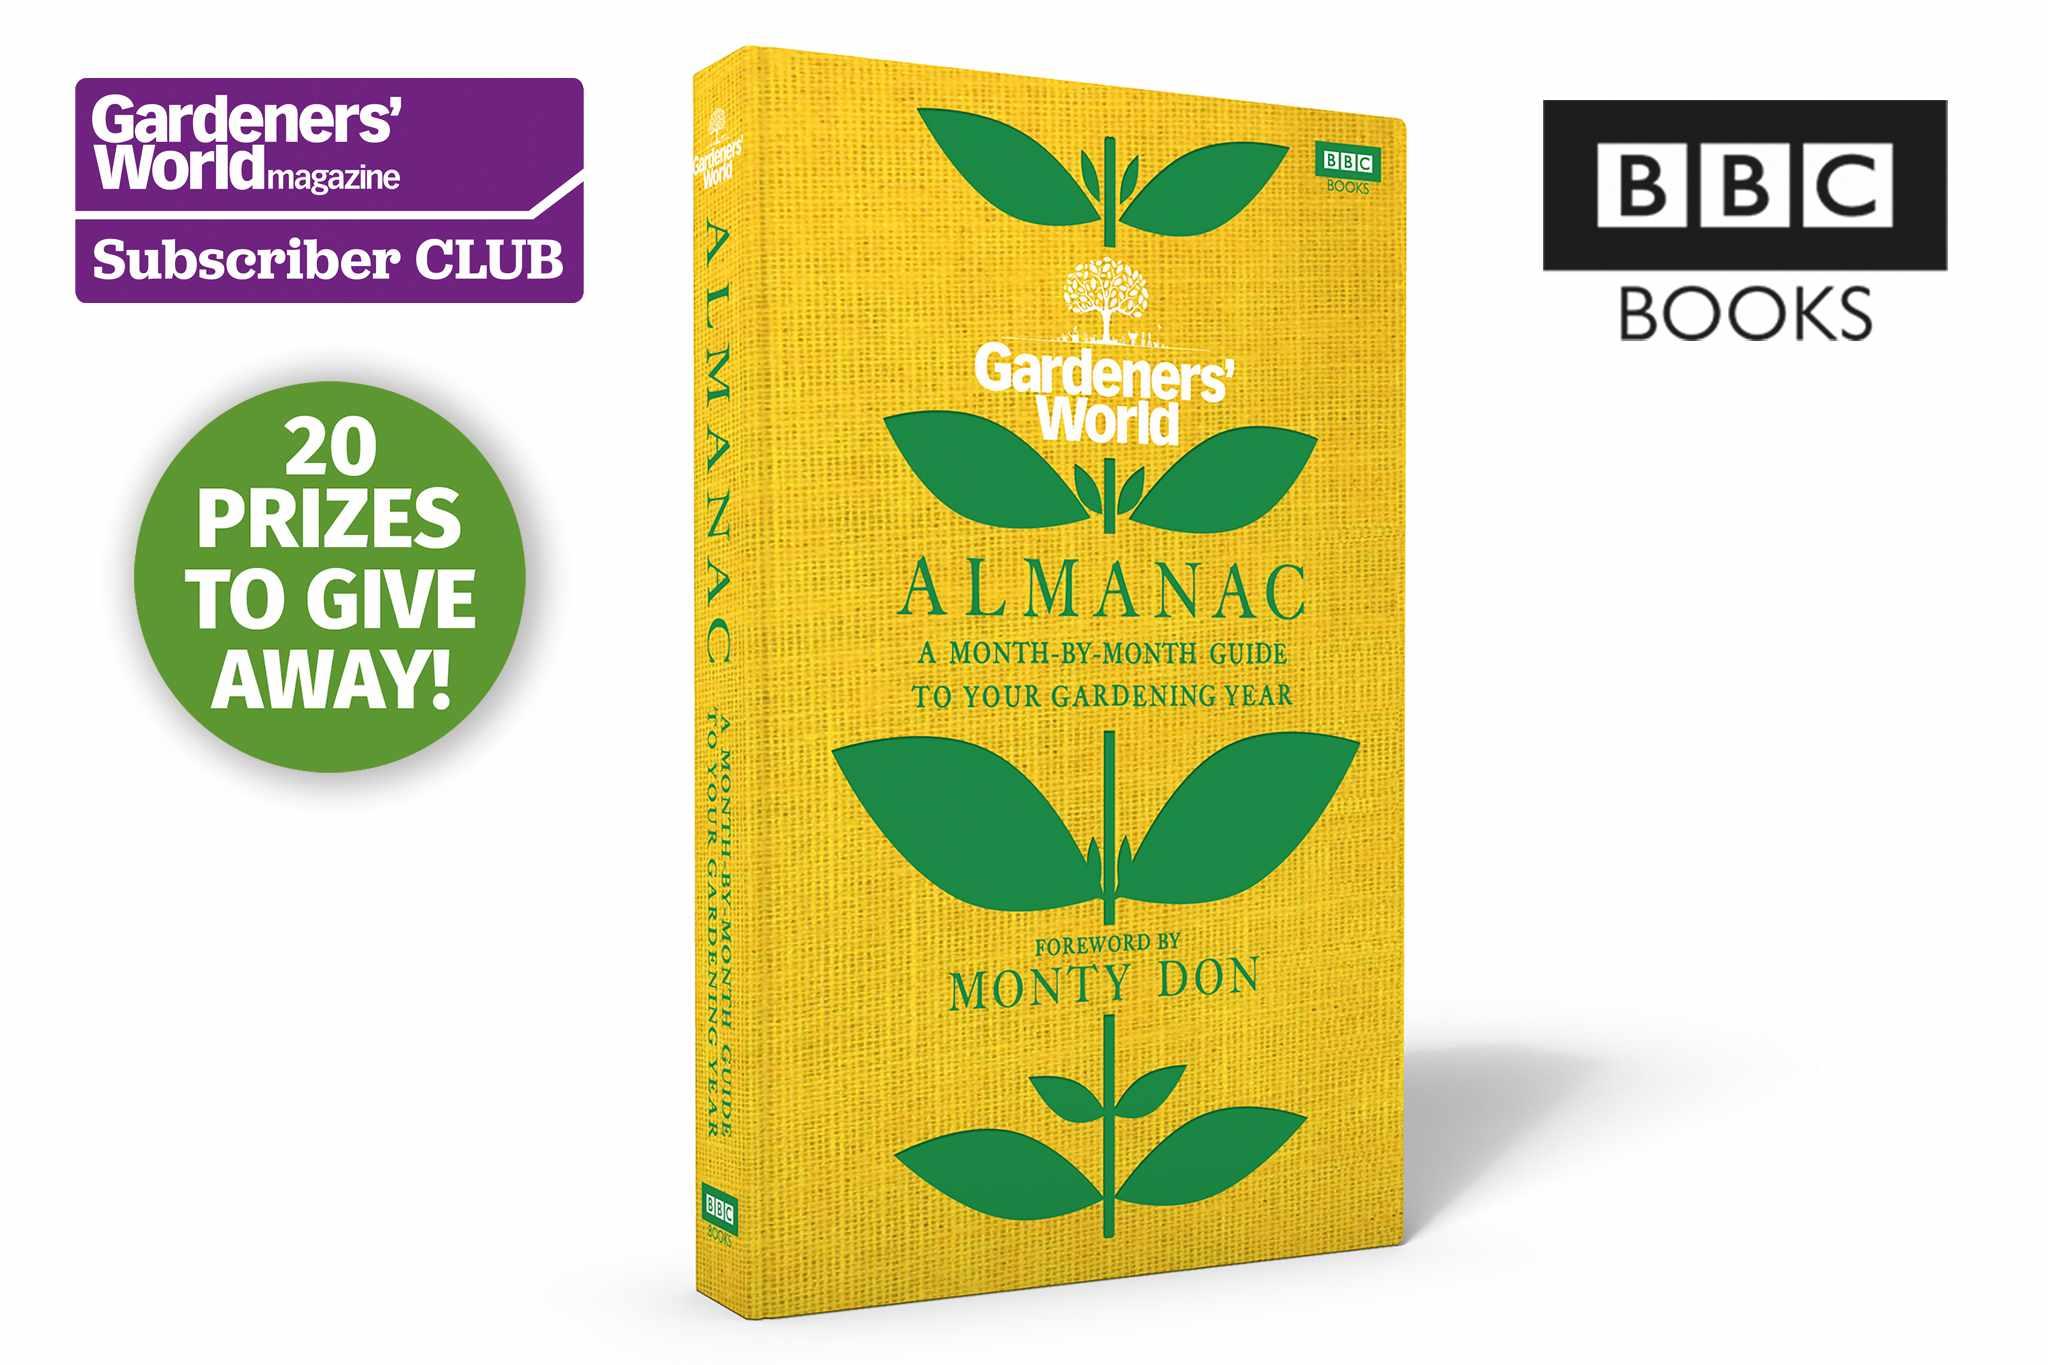 Win a copy of the Gardeners' World Almanac - BBC Gardeners' World Magazine